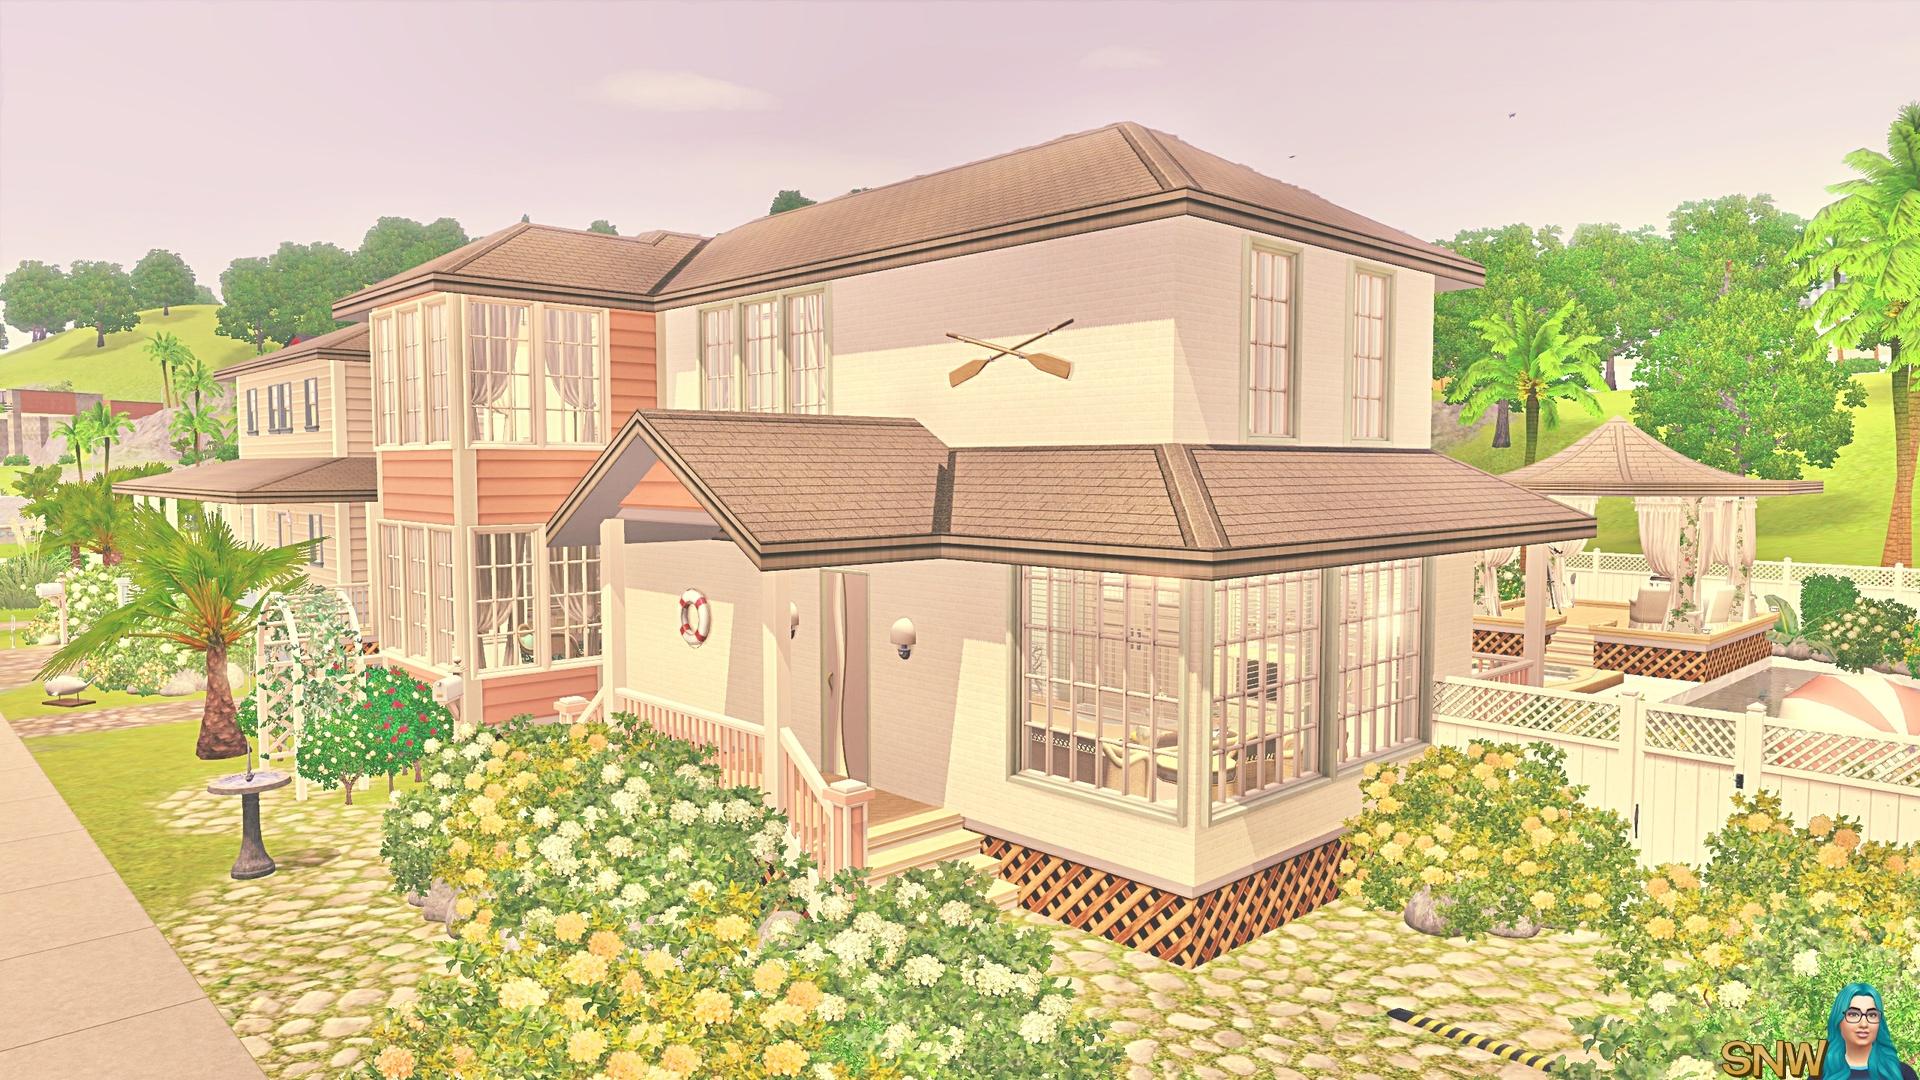 Minty peach beach house snw for Beach house designs for sims 3